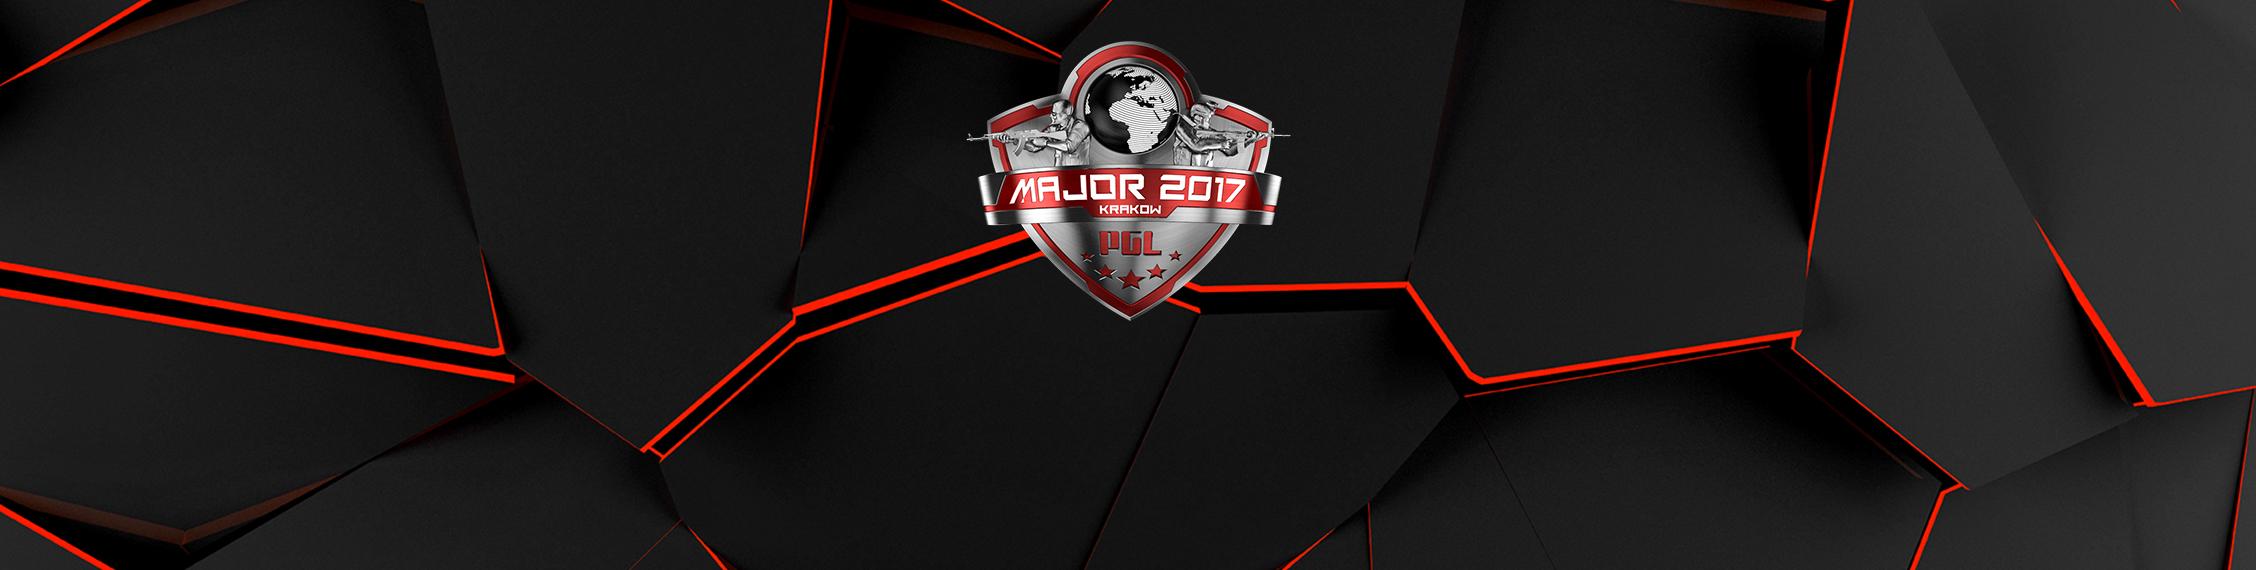 PGL Major Kraków 2017